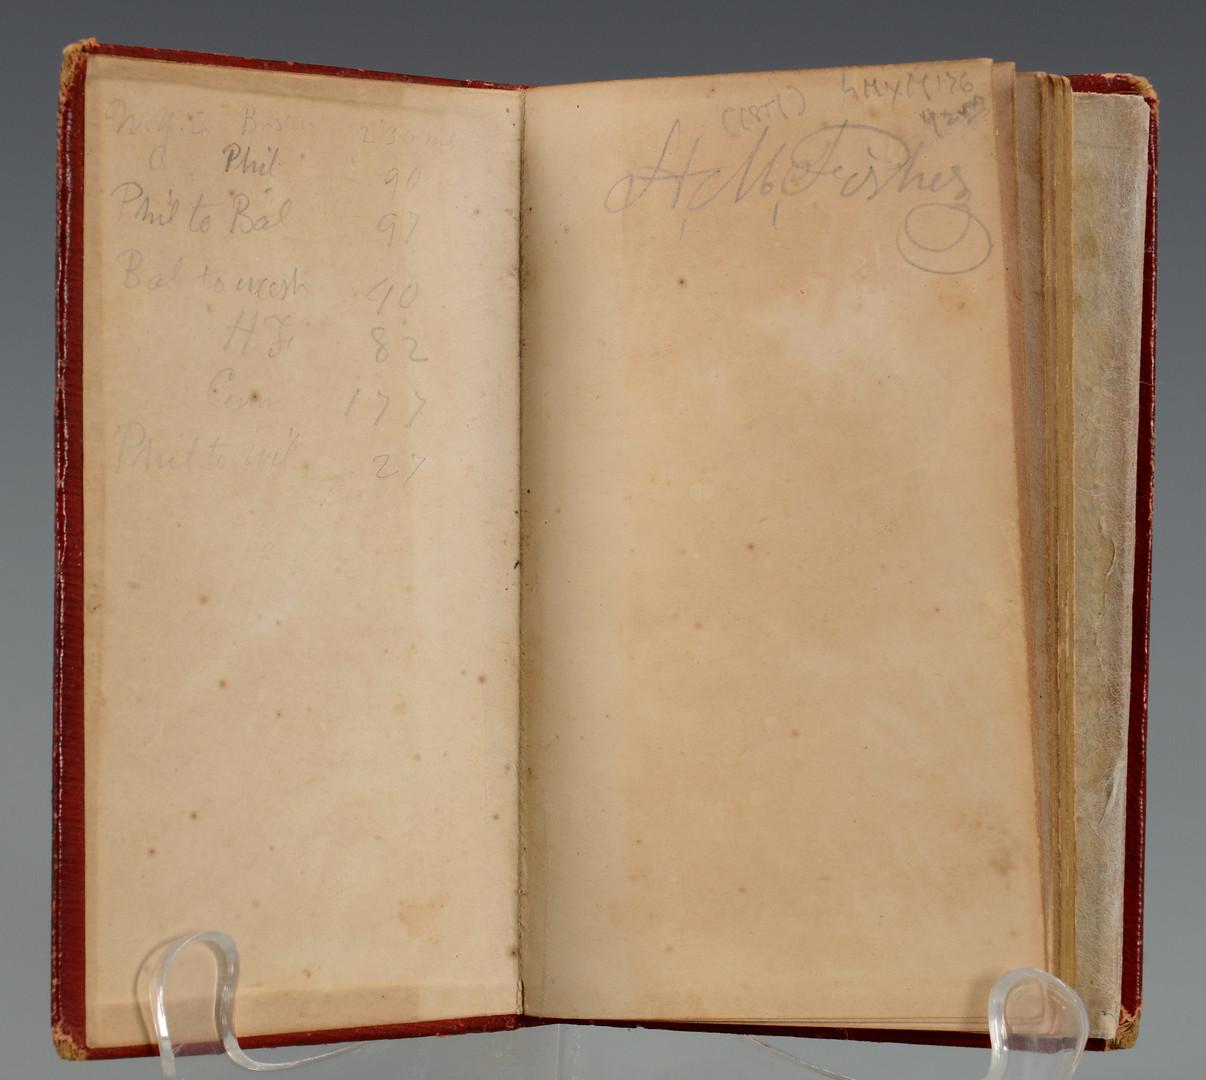 Lot 403: 1857 Phelps pocket map of United States